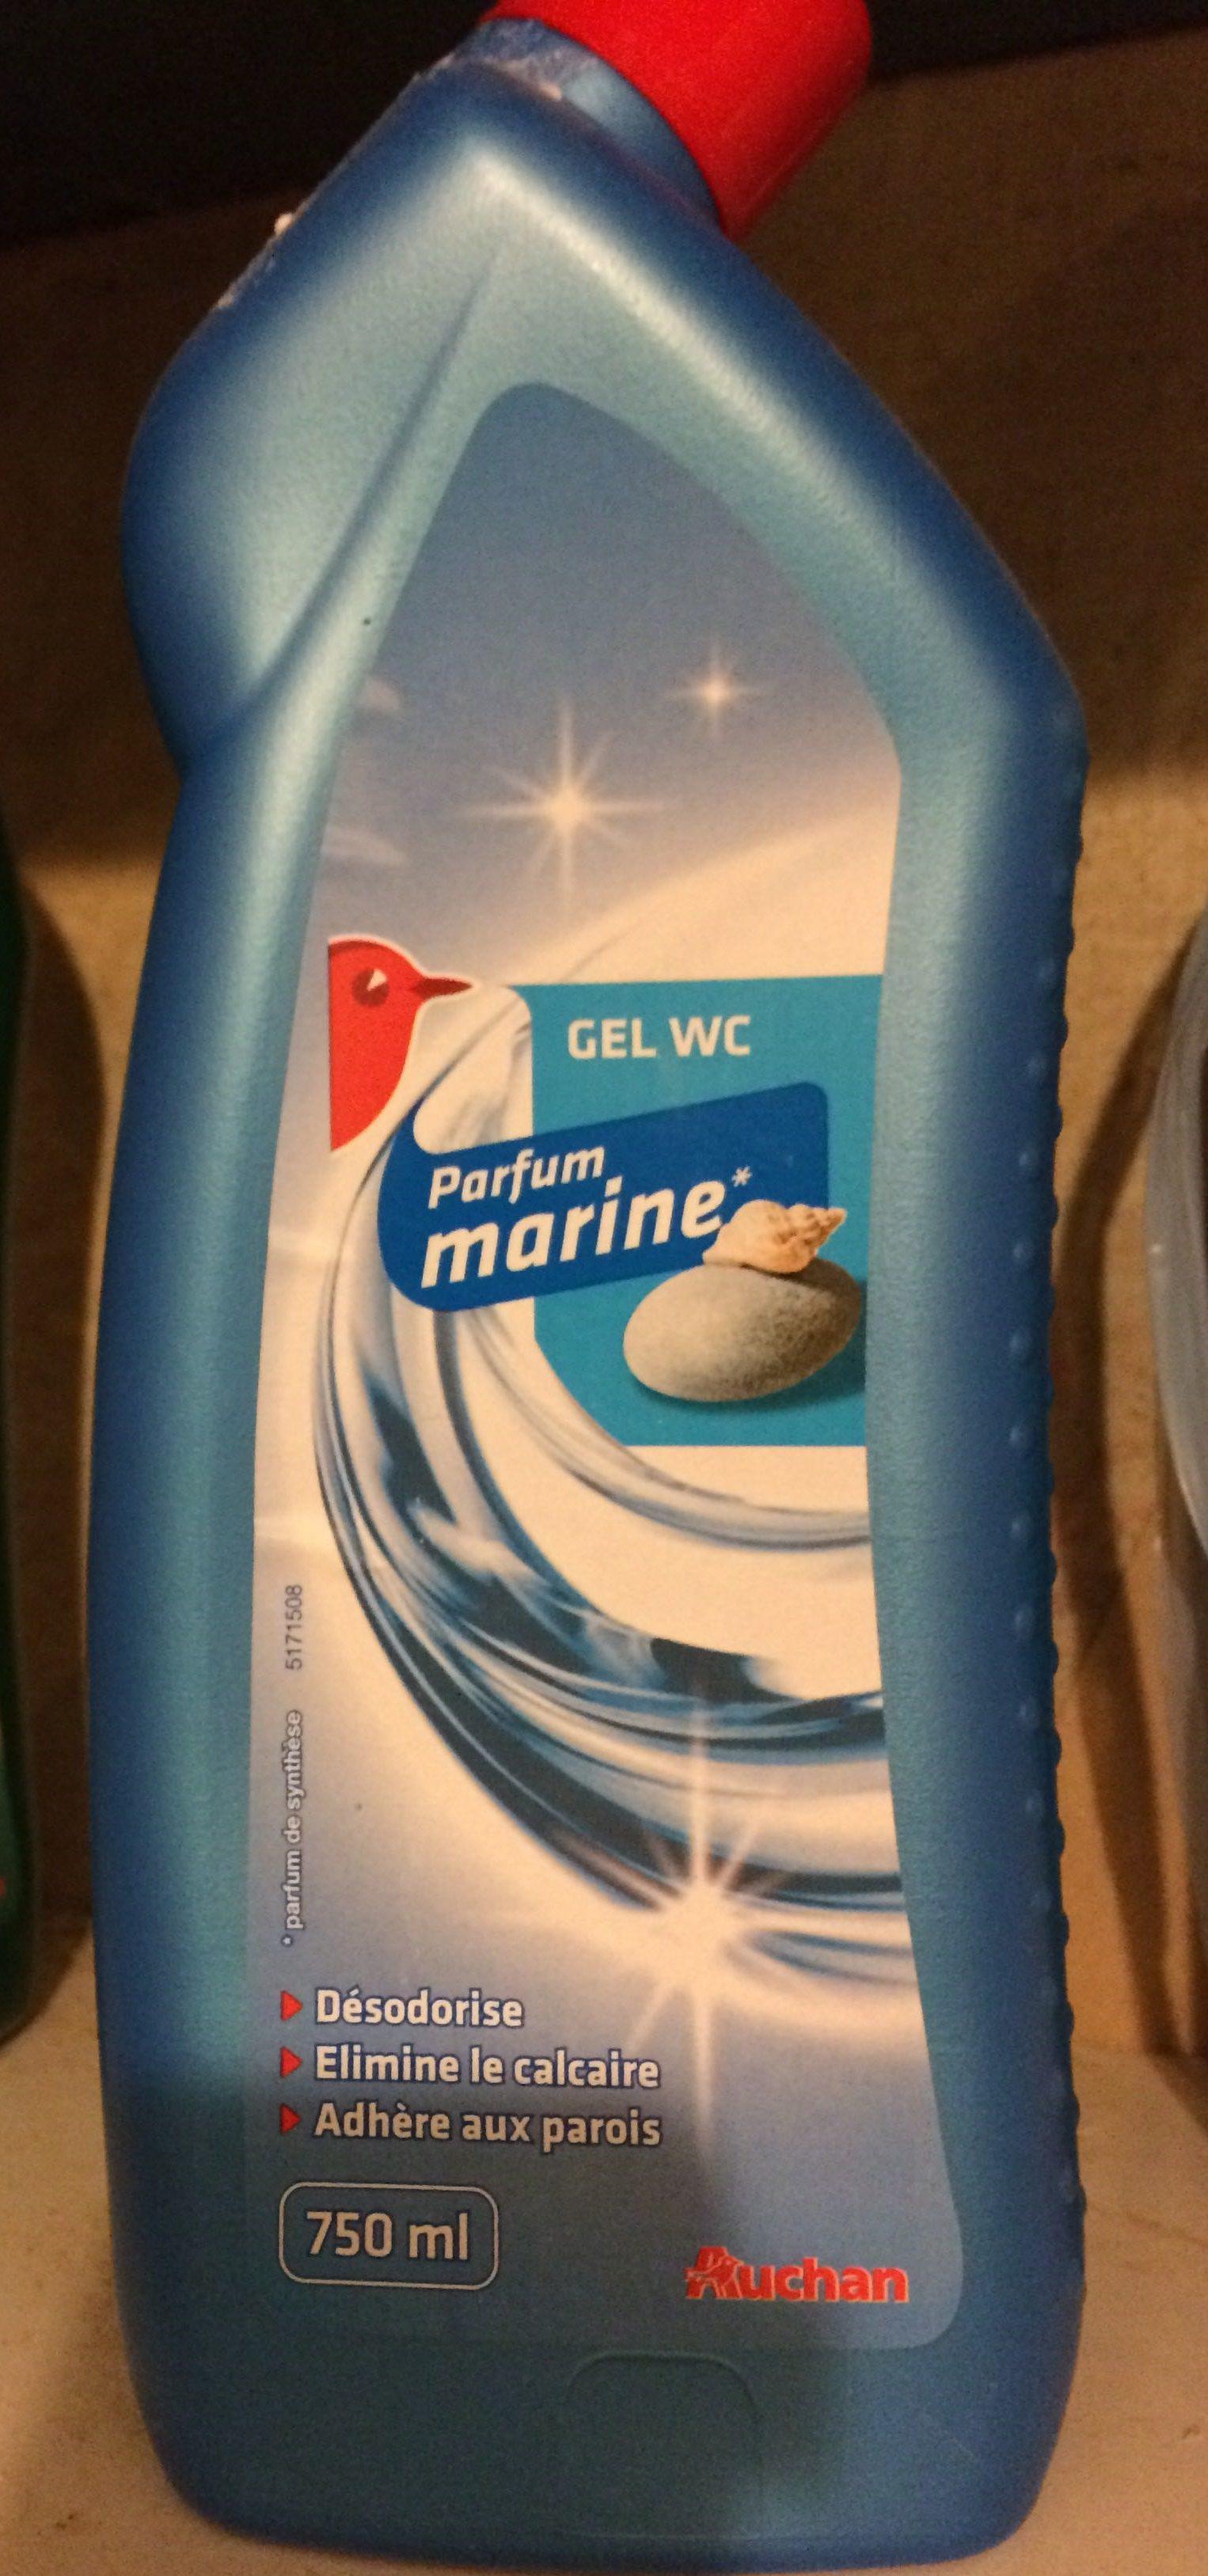 Gel WC parfum marine - Produit